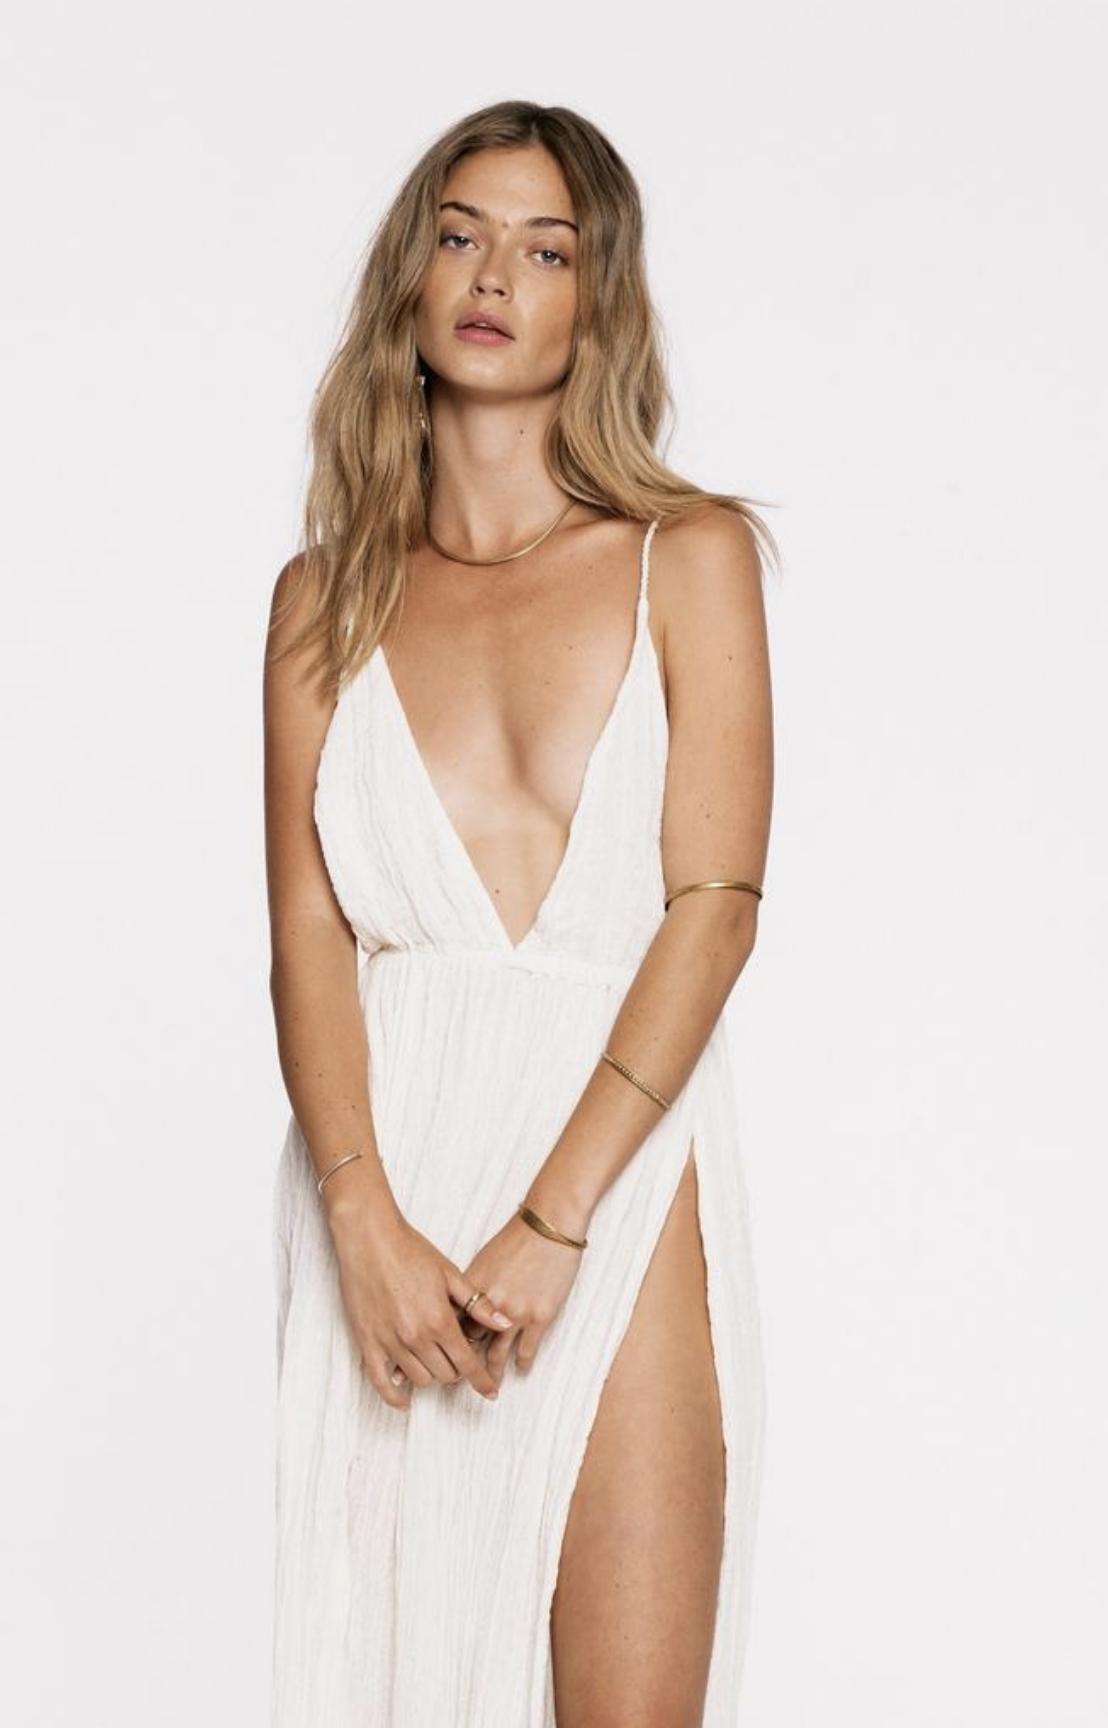 Coco's Island Maxi Dress - $143